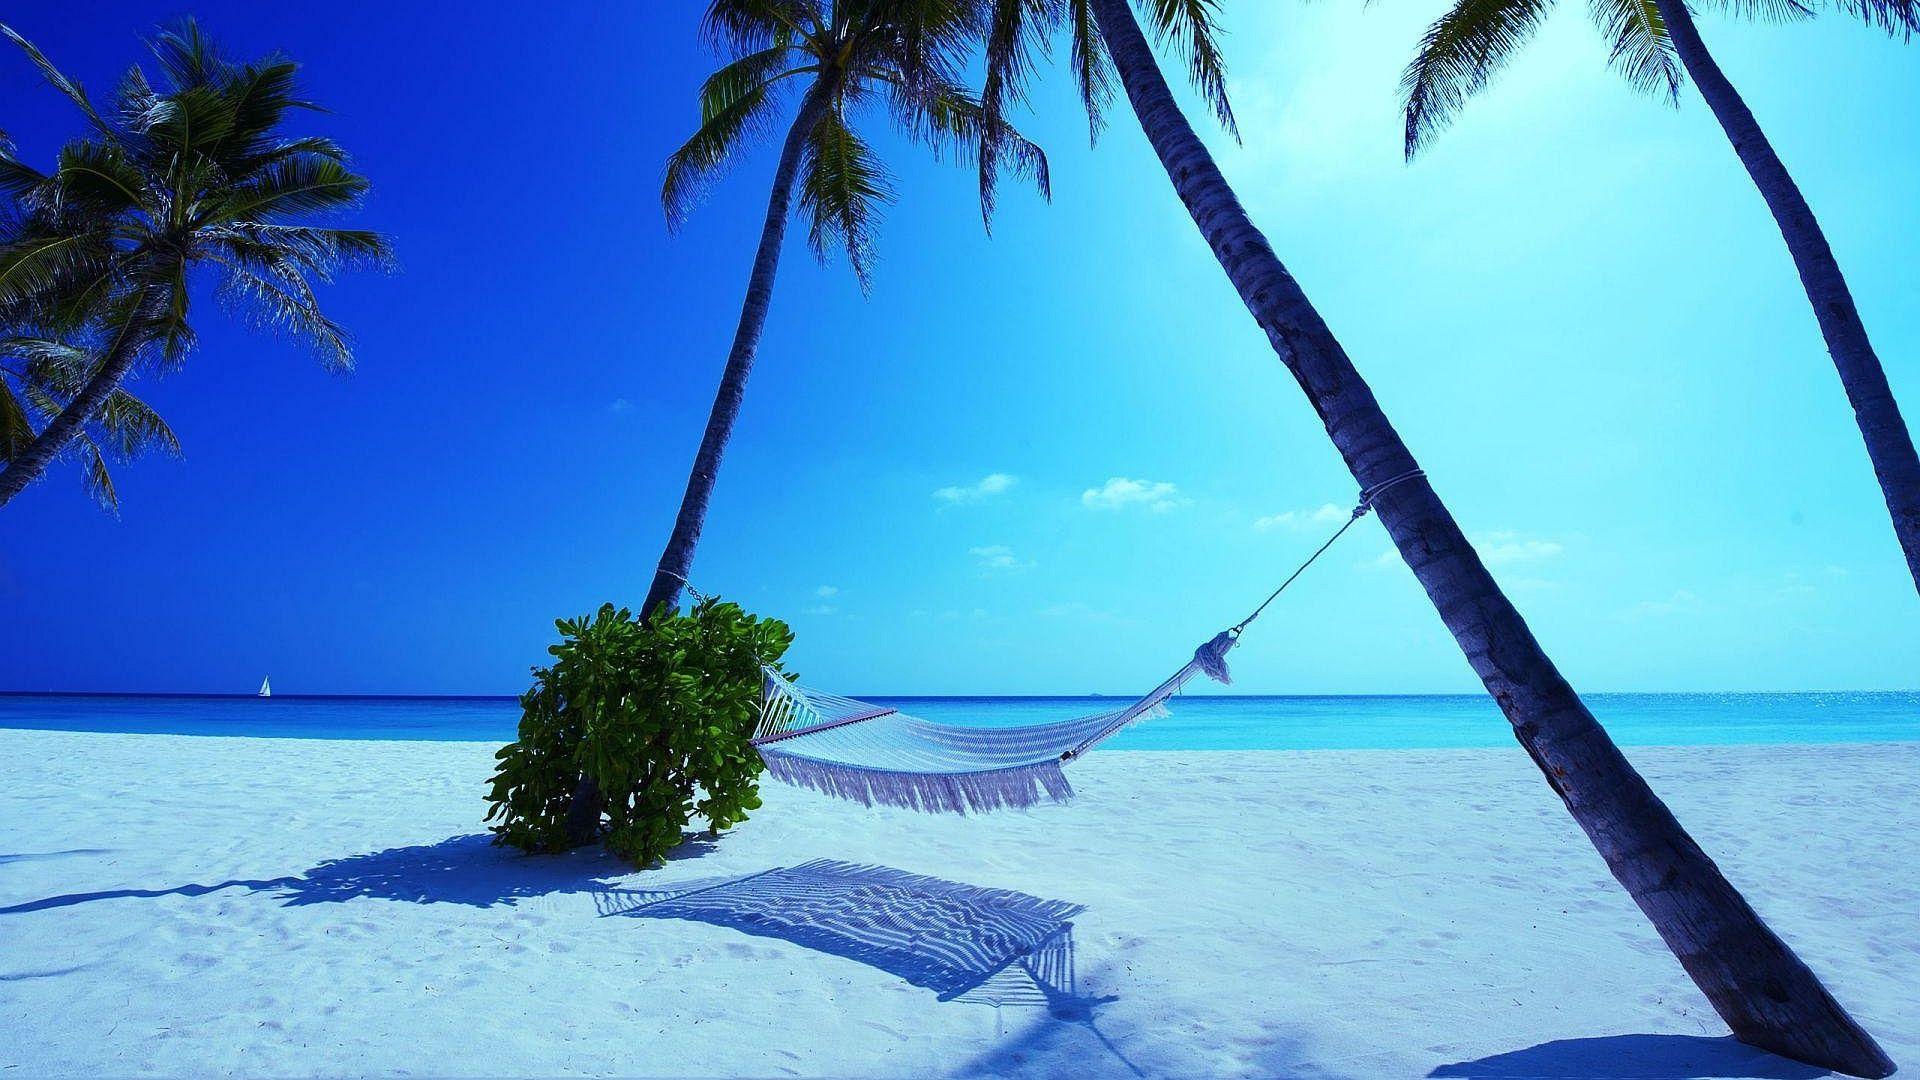 YouWall Maldives Beach Wallpaper Wallpaperwallpapersfree